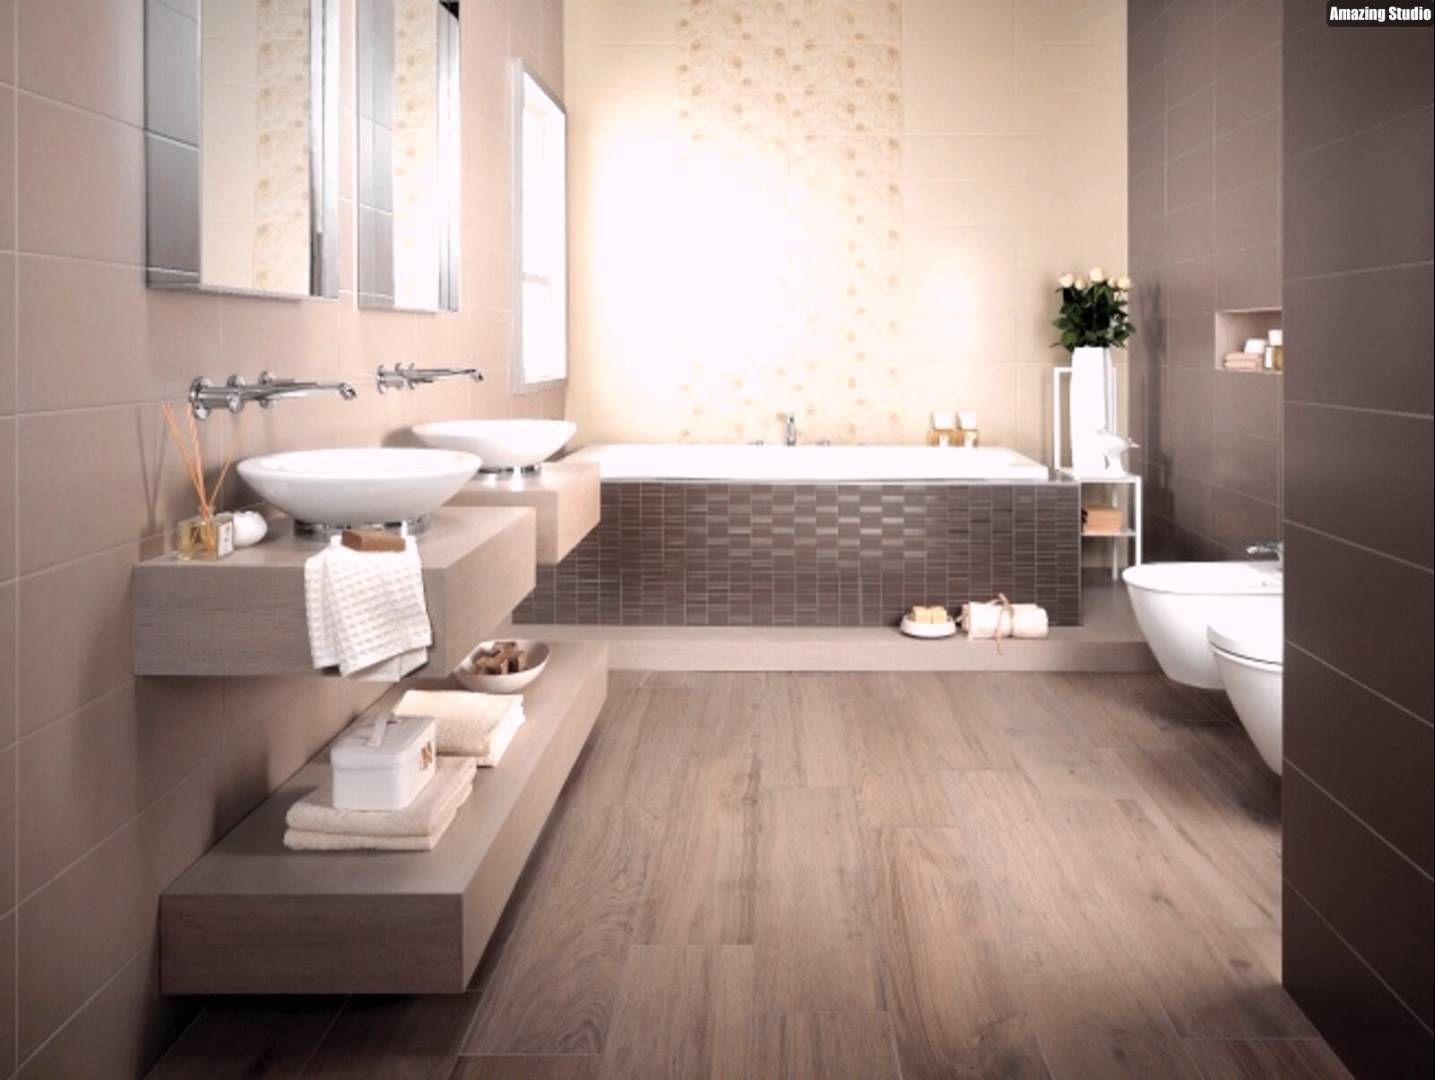 Italienische Badezimmer Fliesen Neutrale Farben Atlas | bungalow ...